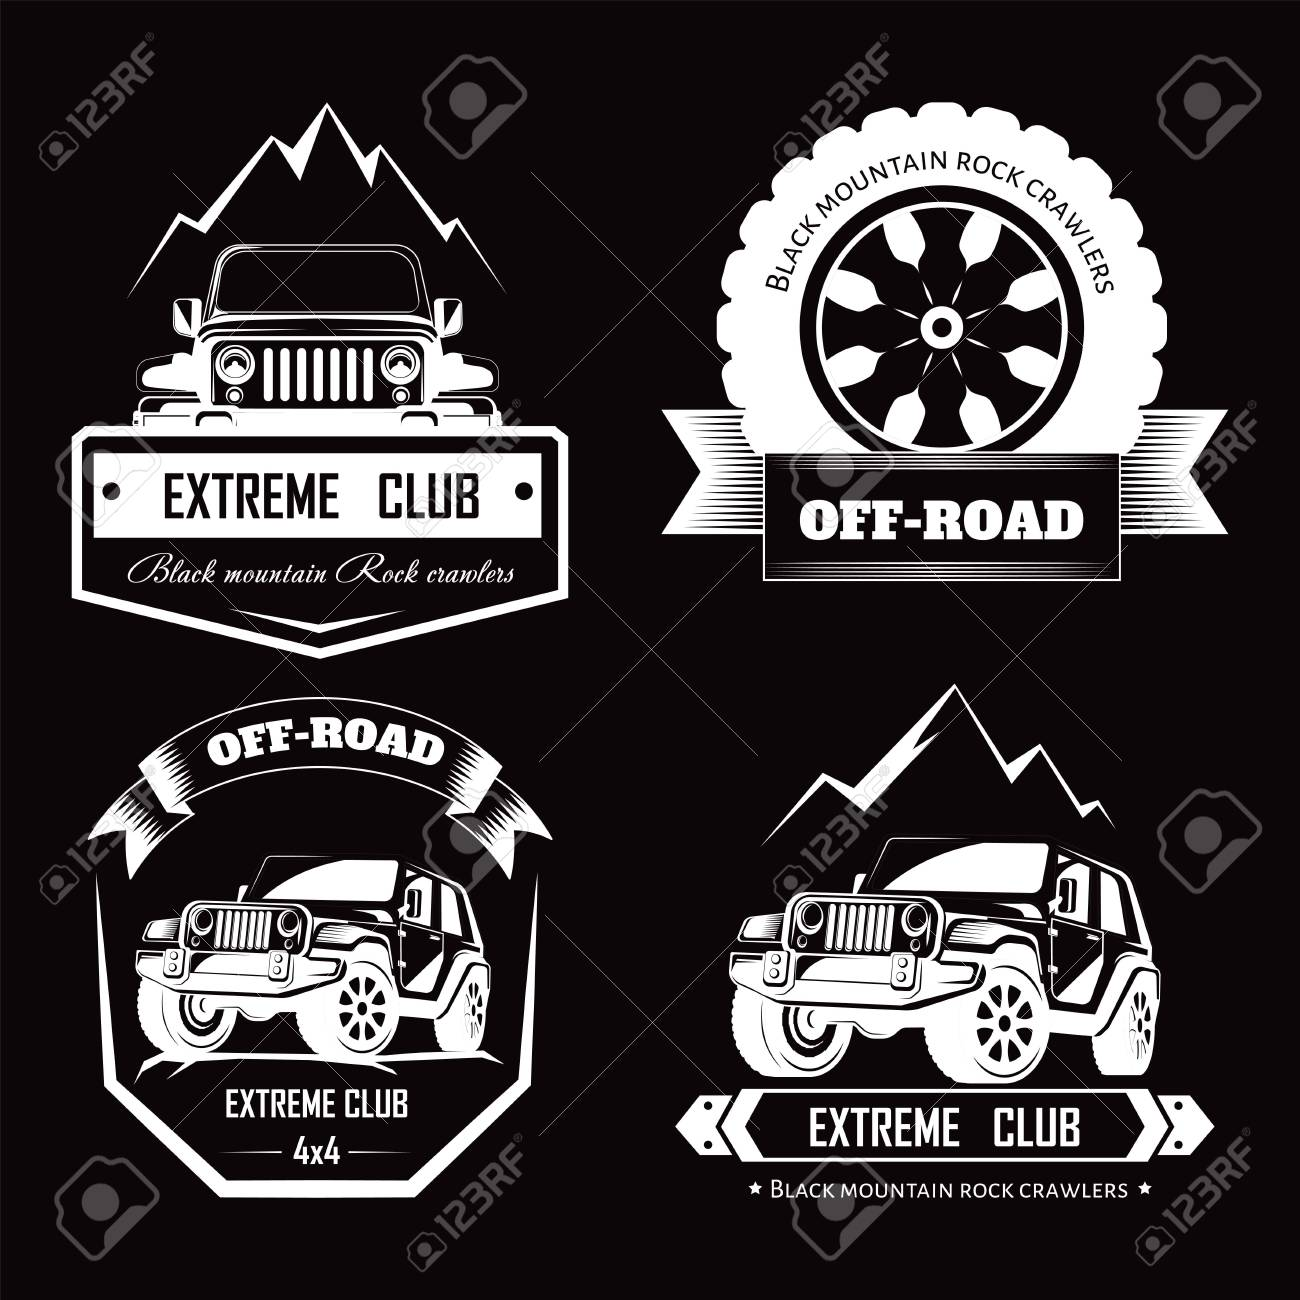 Off Road 4x4 Extreme Car Club Logo Templates Vector Symbols Royalty Free Cliparts Vectors And Stock Illustration Image 111124350